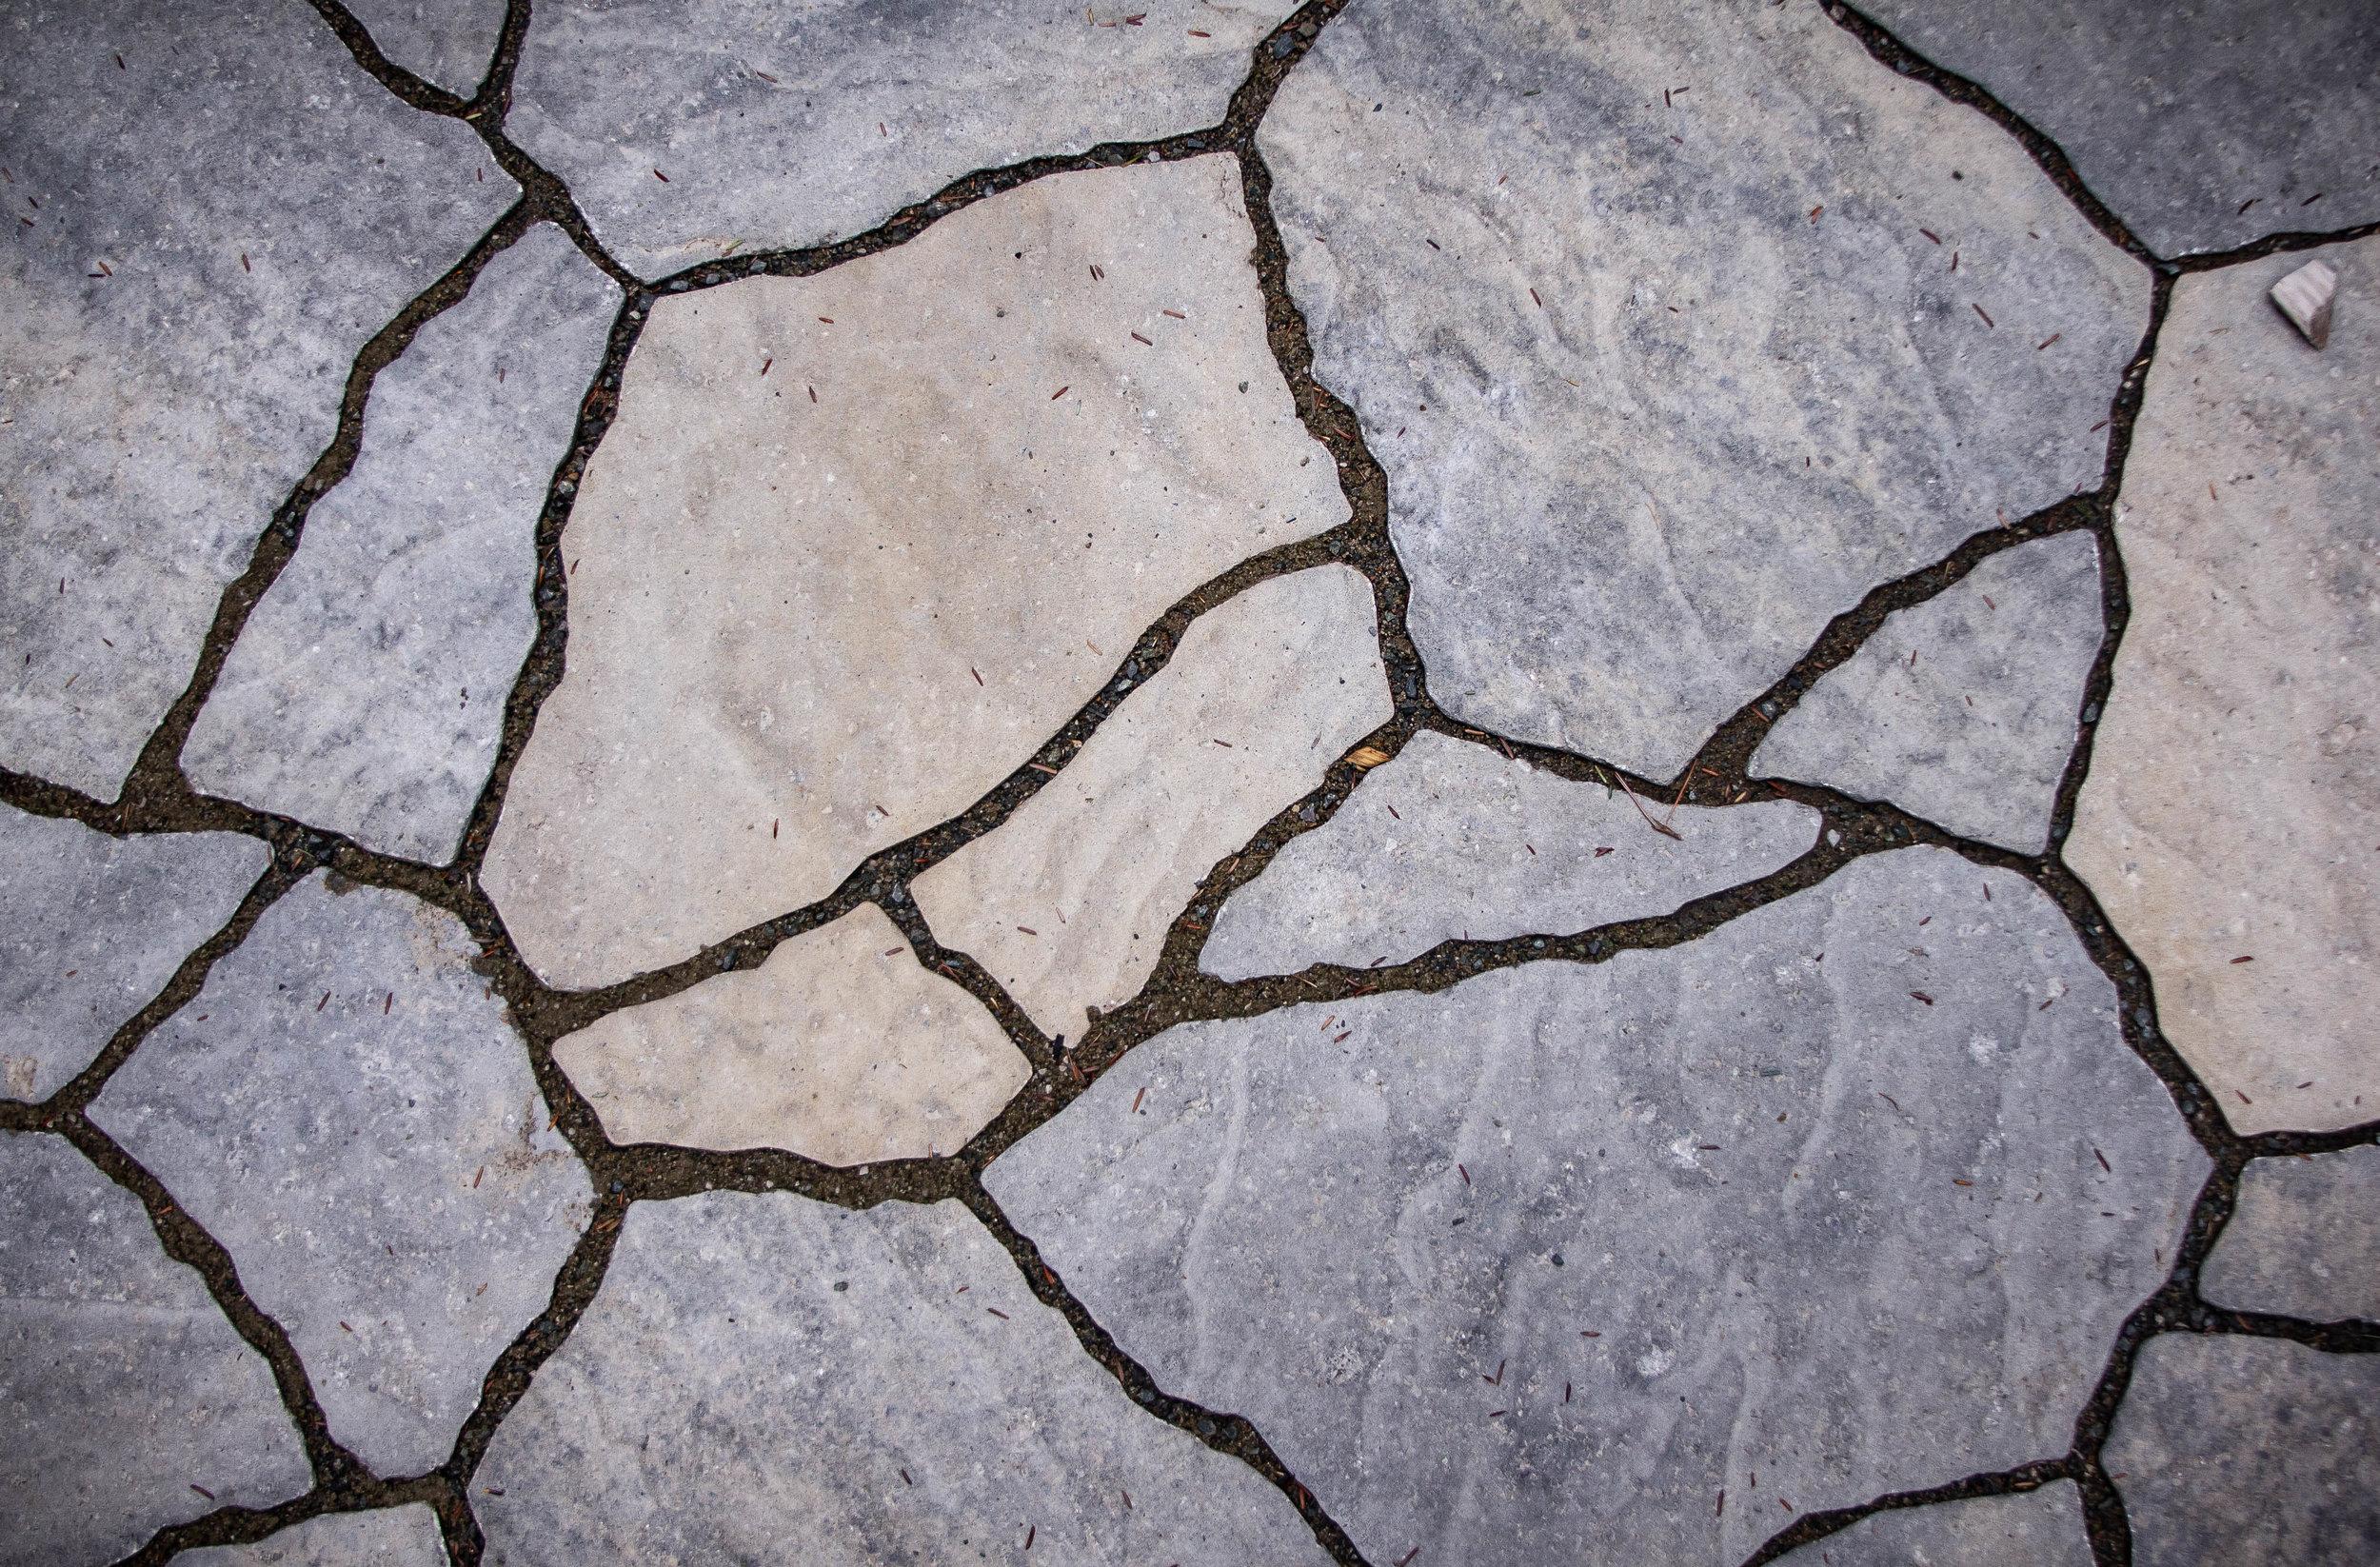 rosseta-stone.jpg